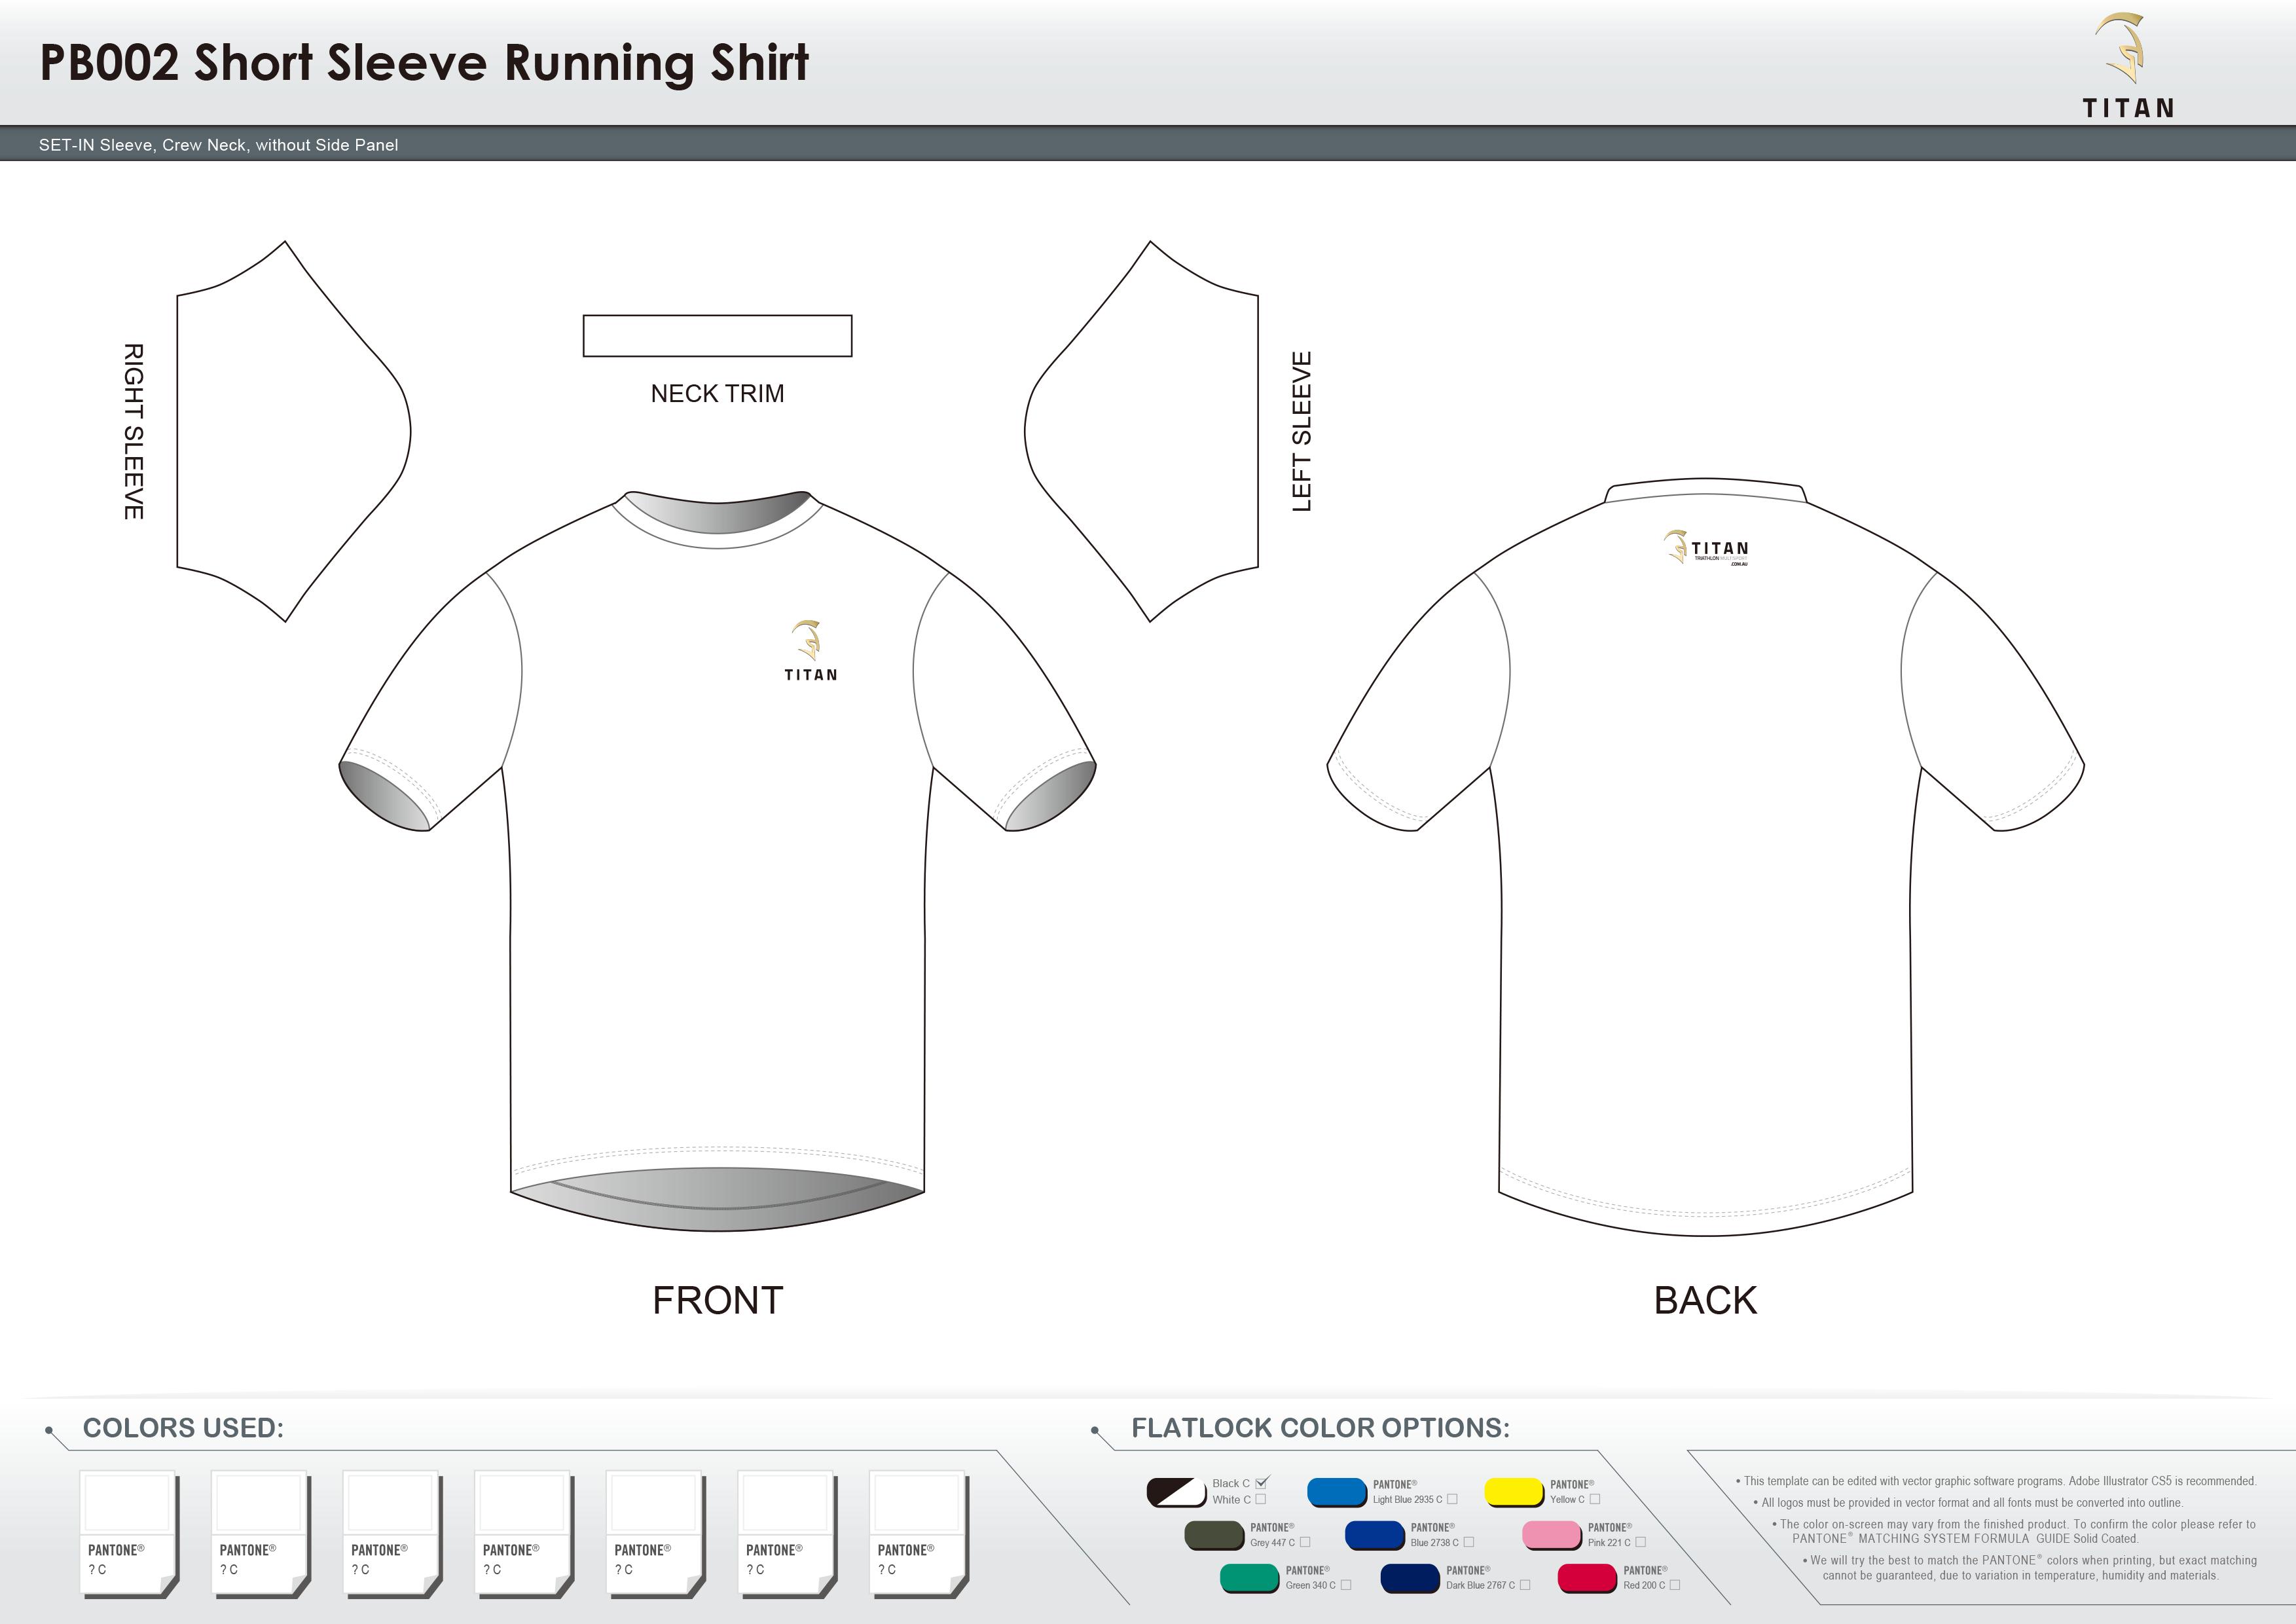 PB002 Short Sleeve Running Shirt